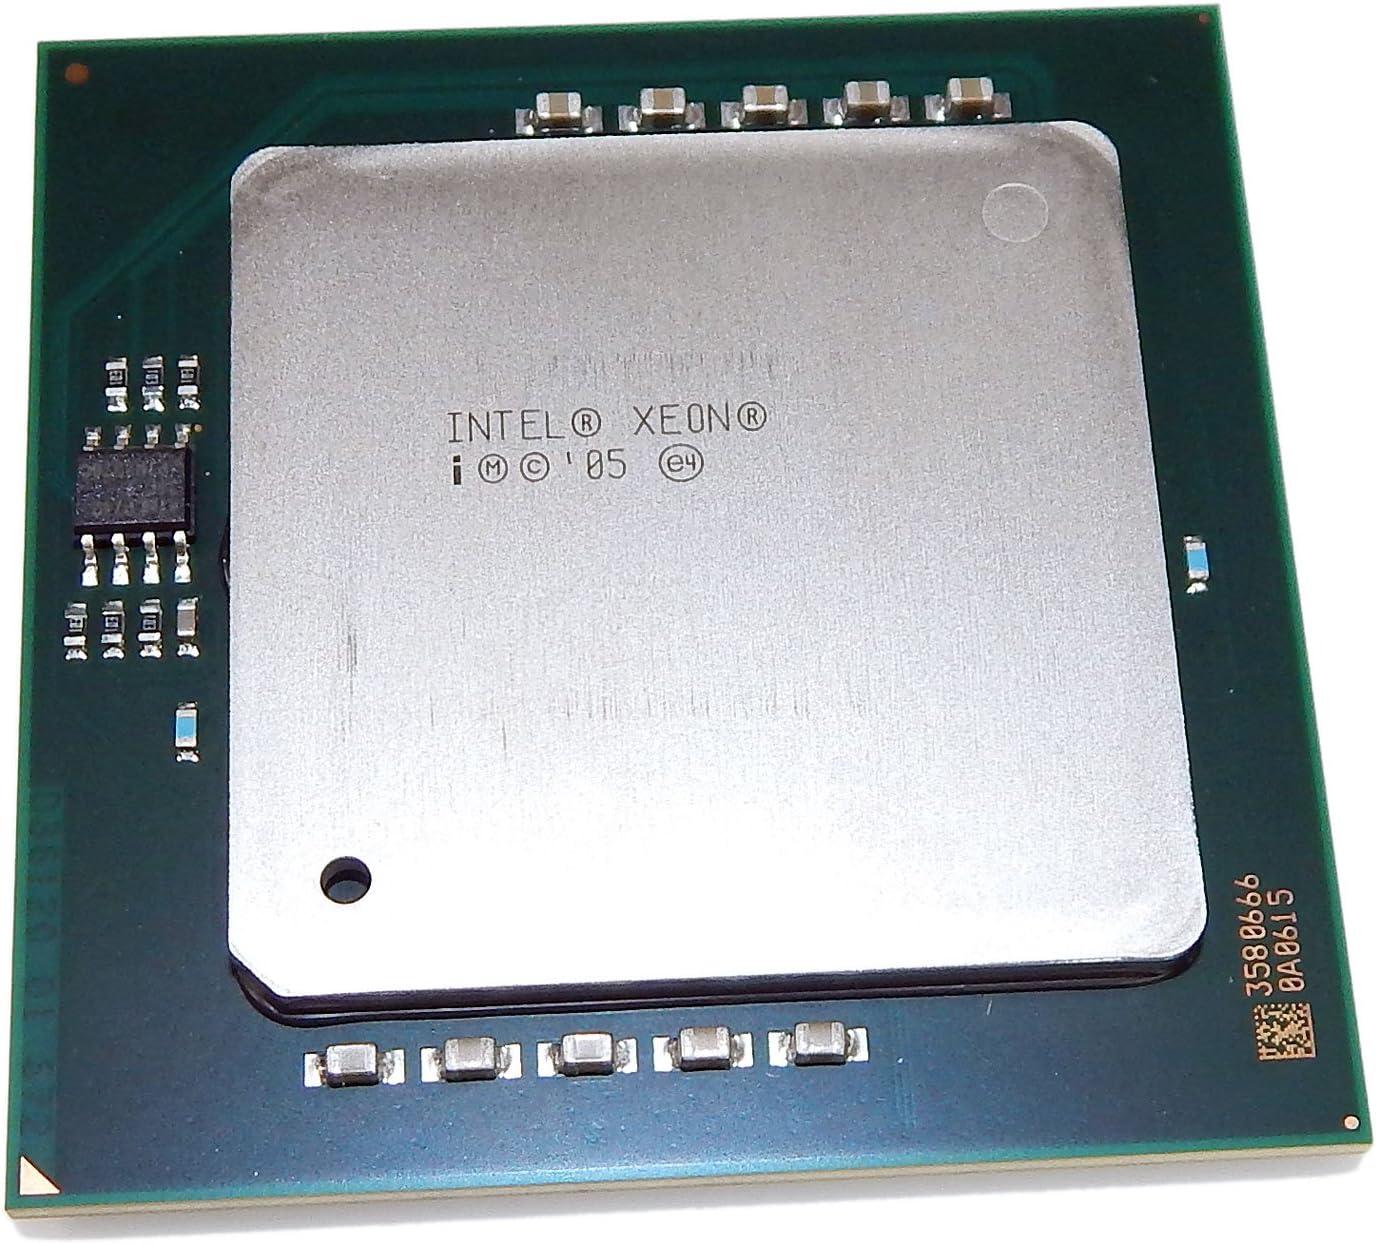 Intel Xeon Quad-Core1066MHz E7340 8M 2.40GHz CPU SLA68